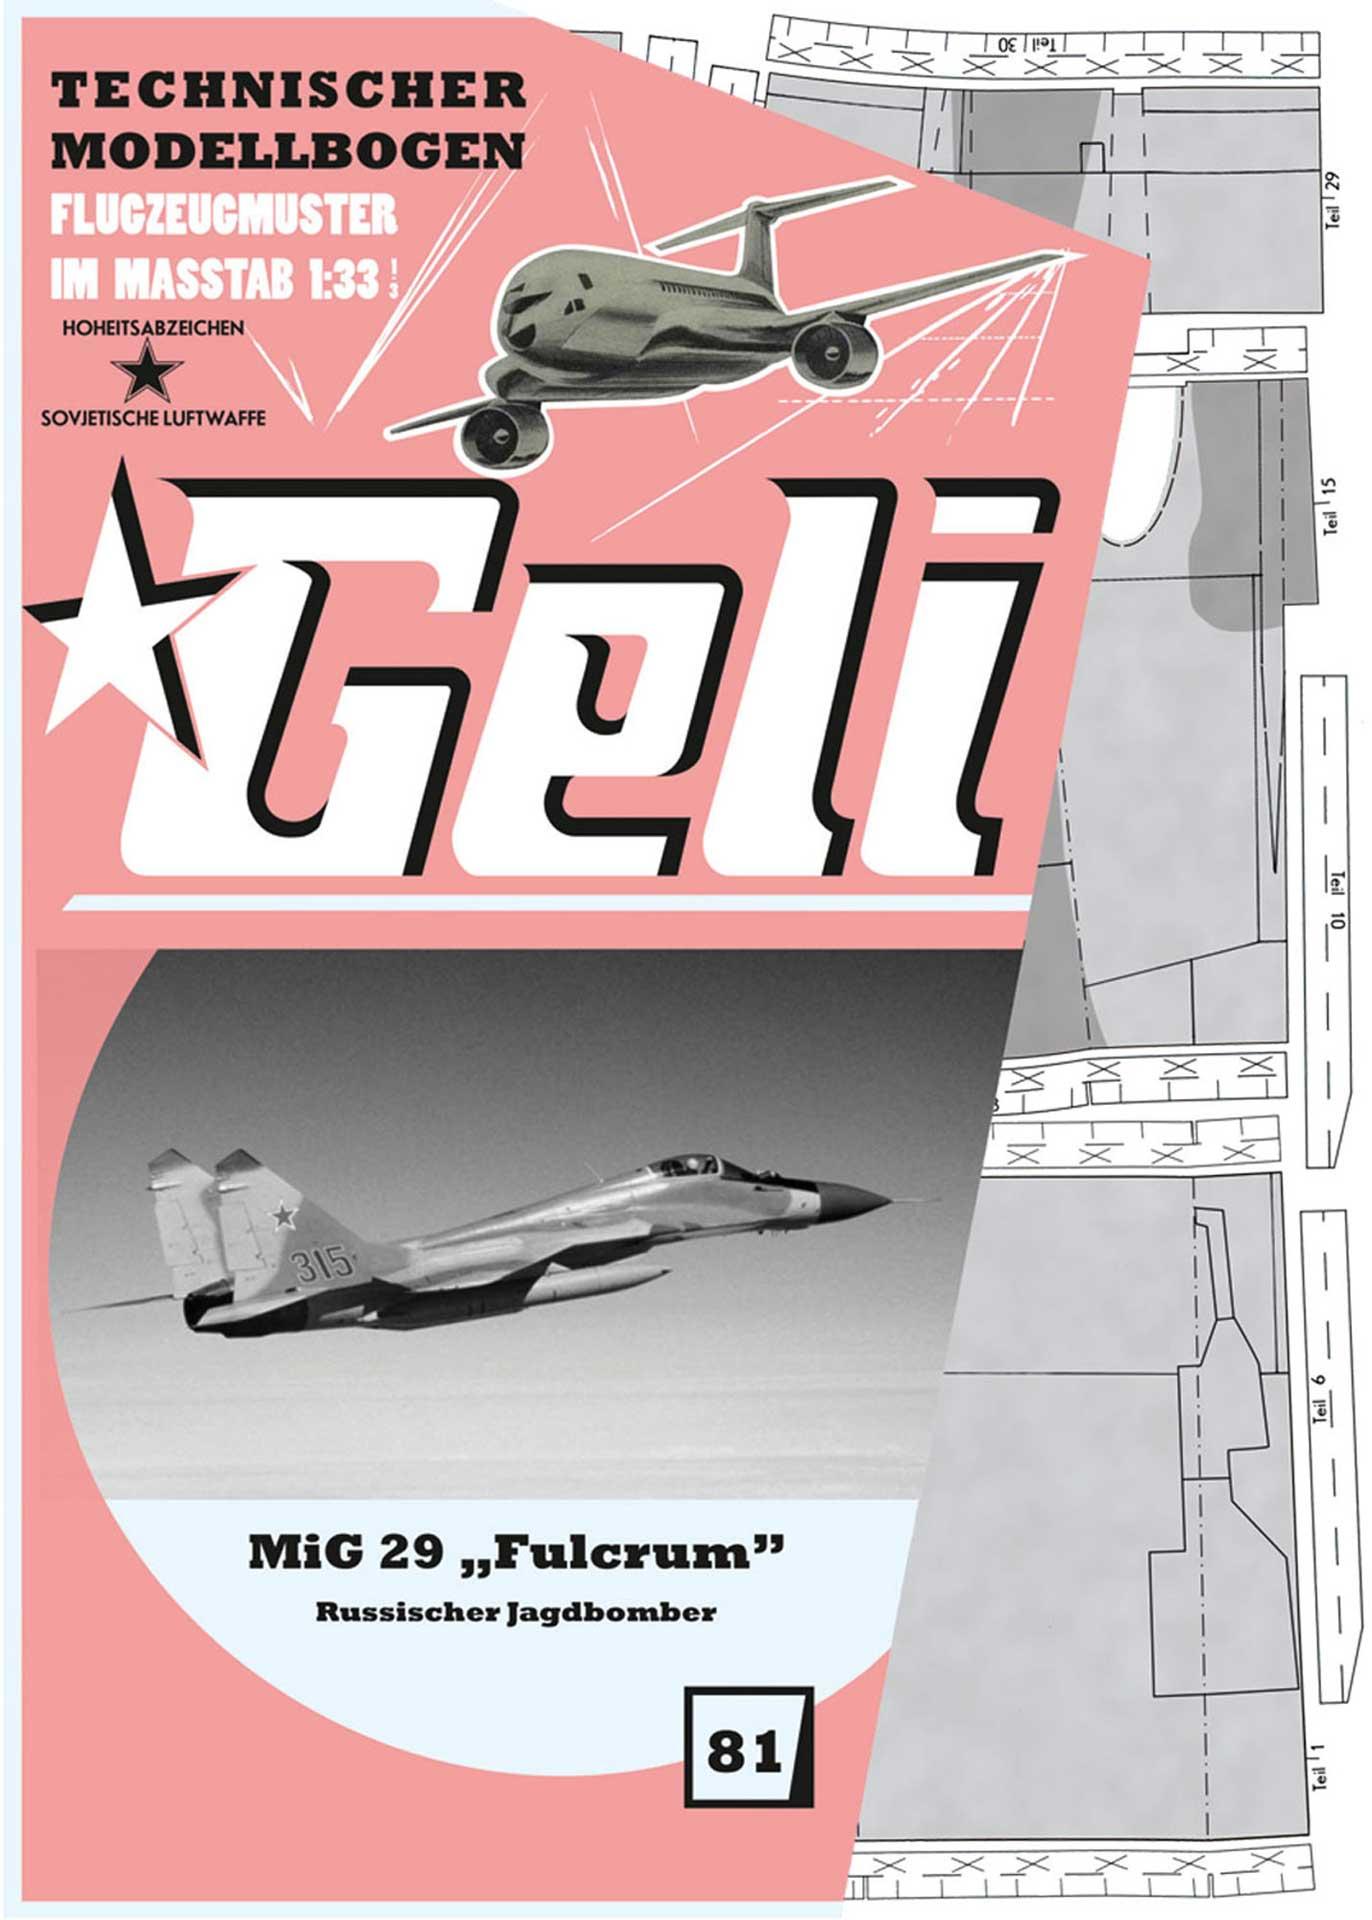 GELI MIG-29 # 81 KARTONMODELL